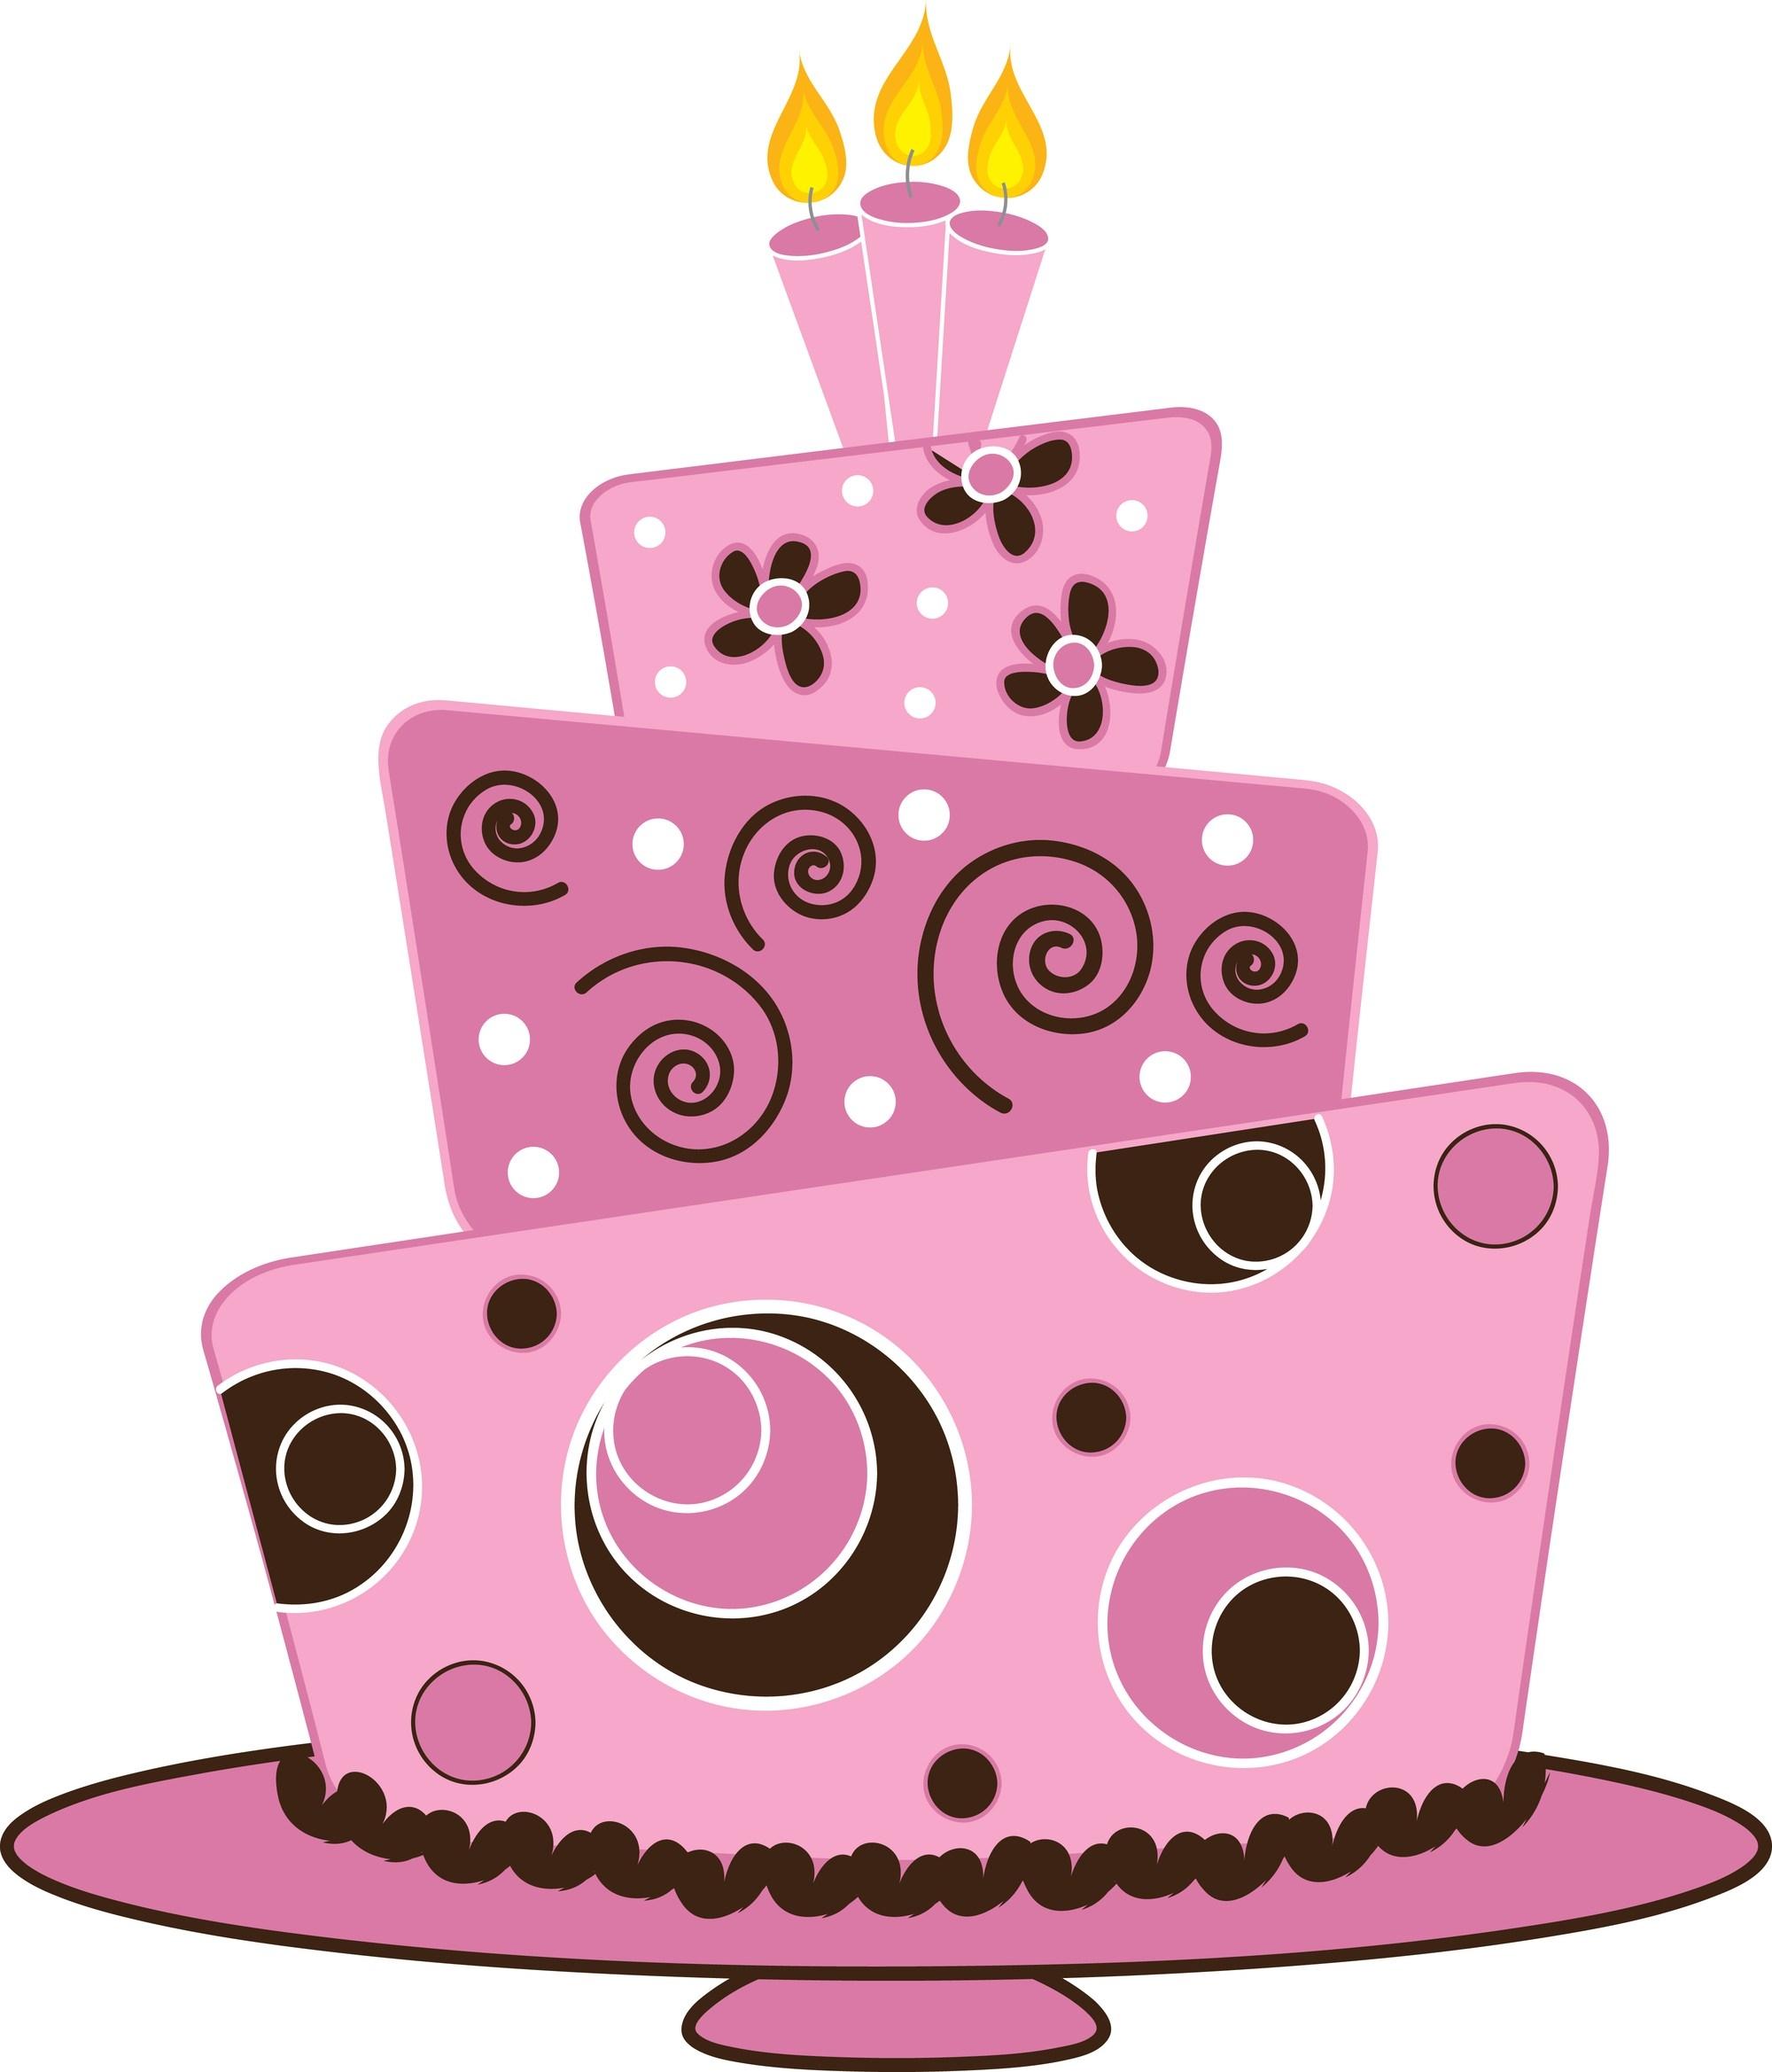 Birthday Cake Animated Clip Art 20 Free Cliparts